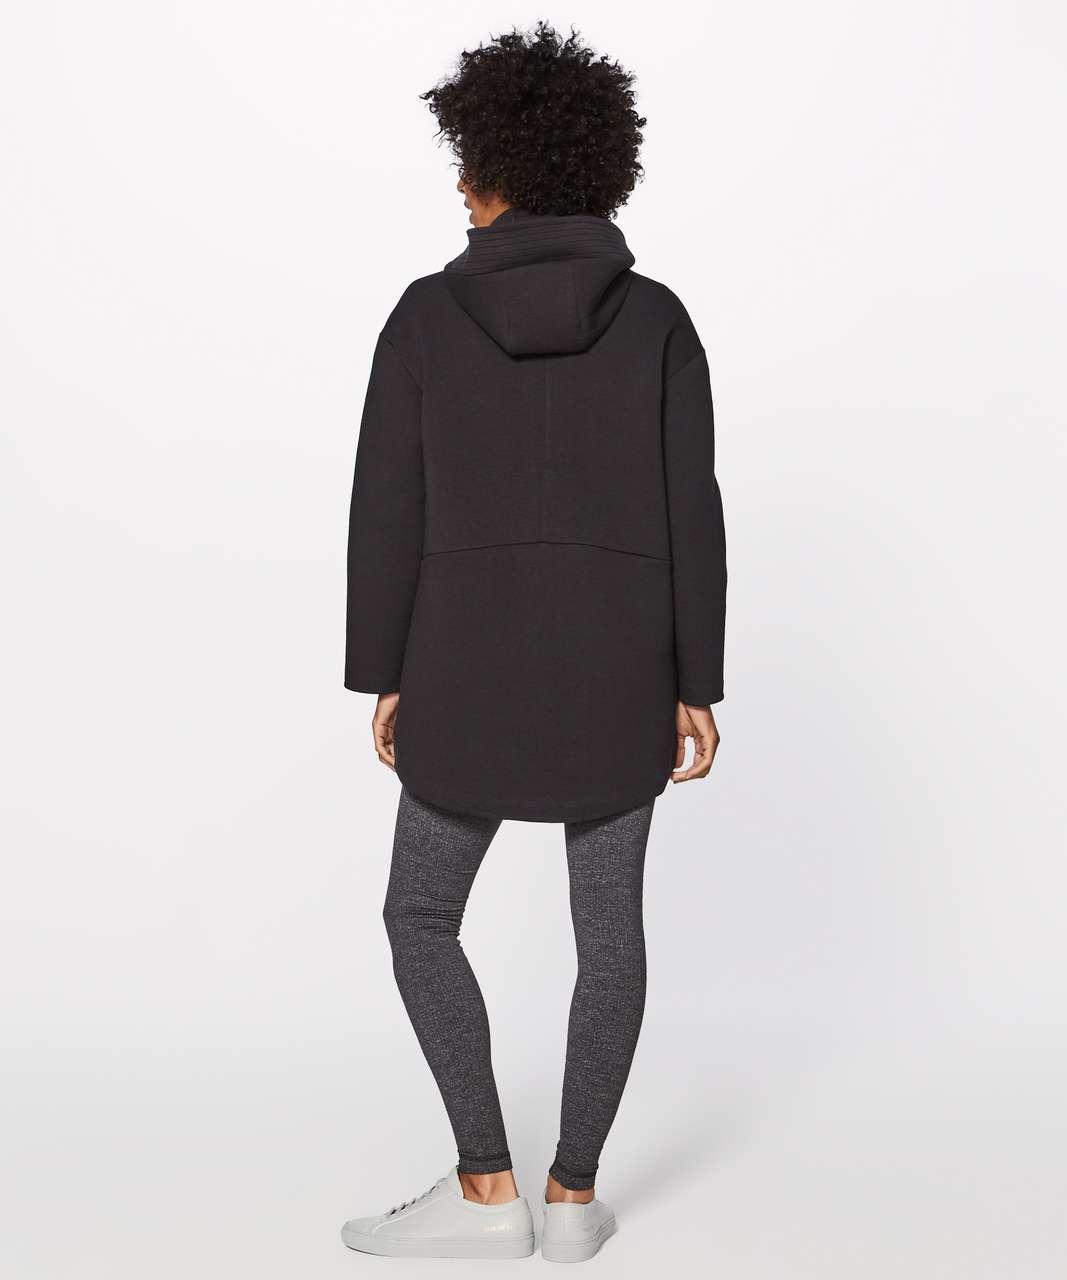 Lululemon New Form Coat - Black